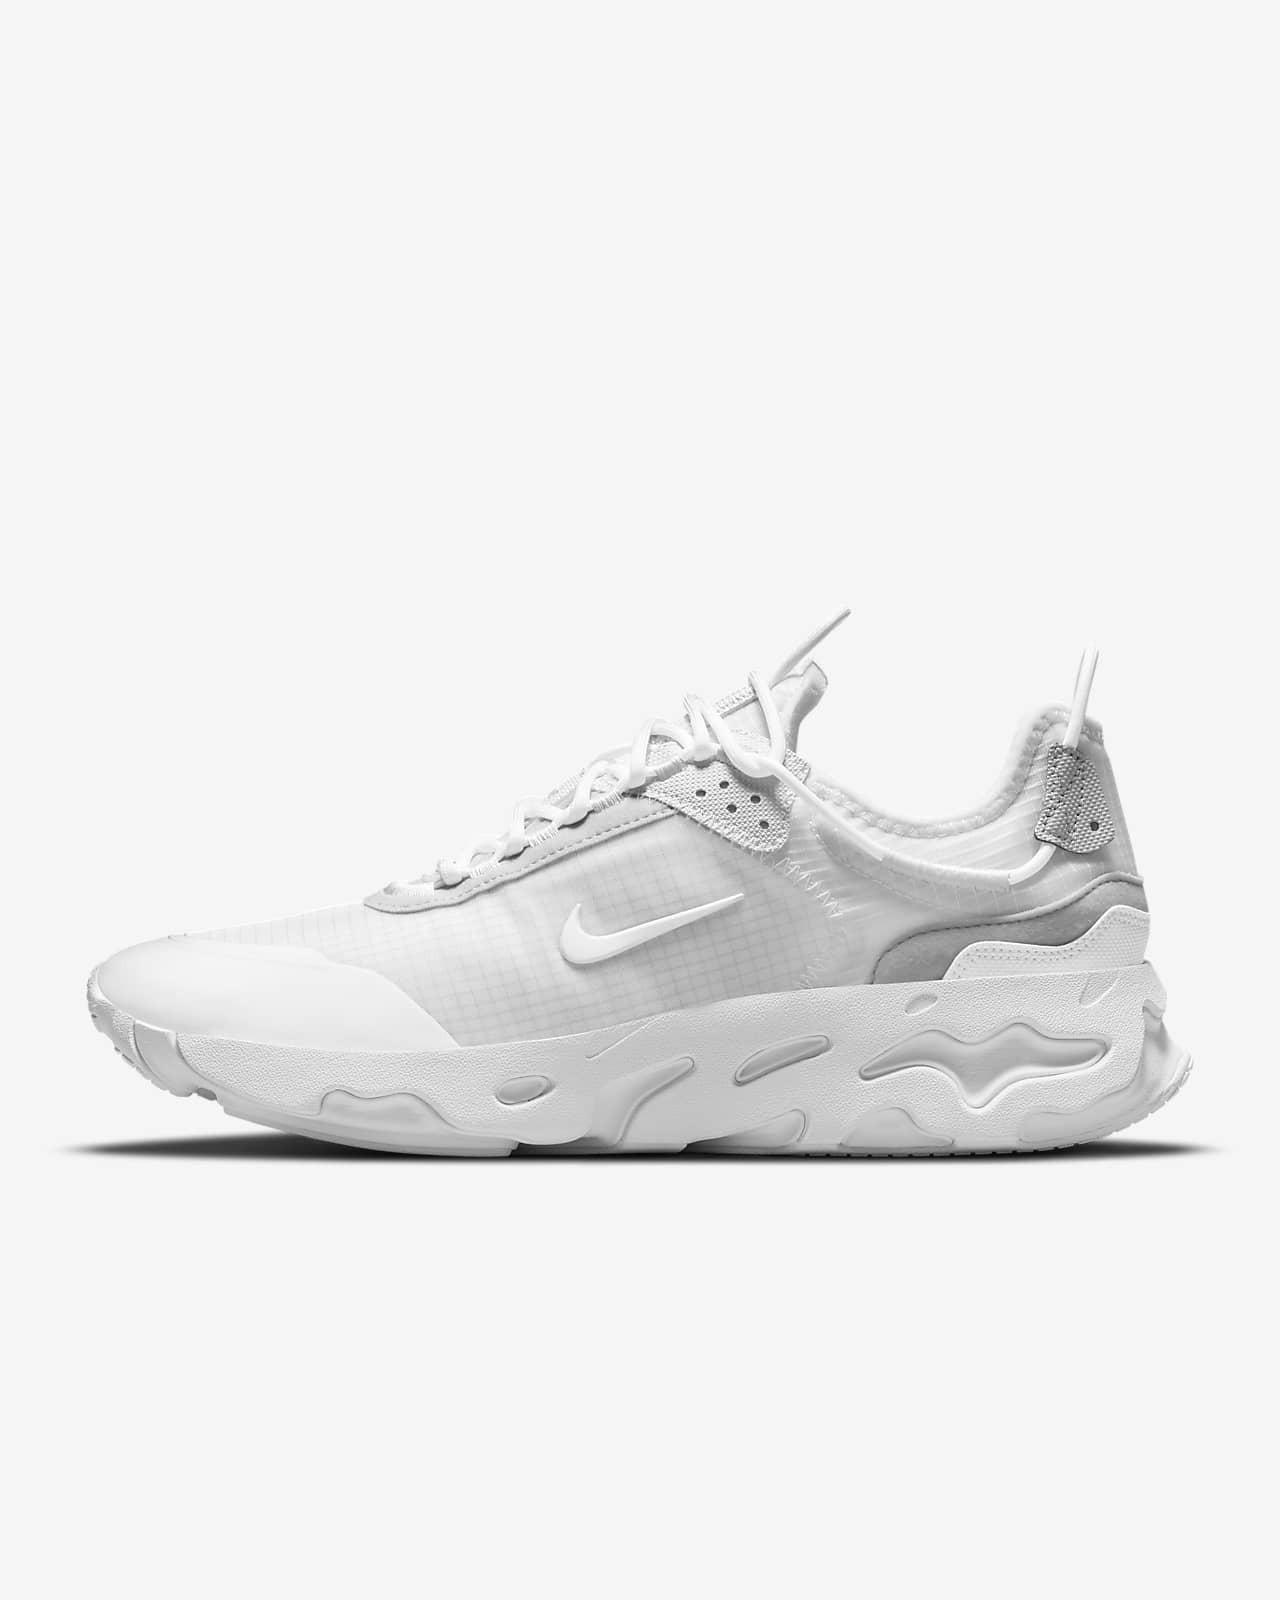 Nike React Live Men's Shoe